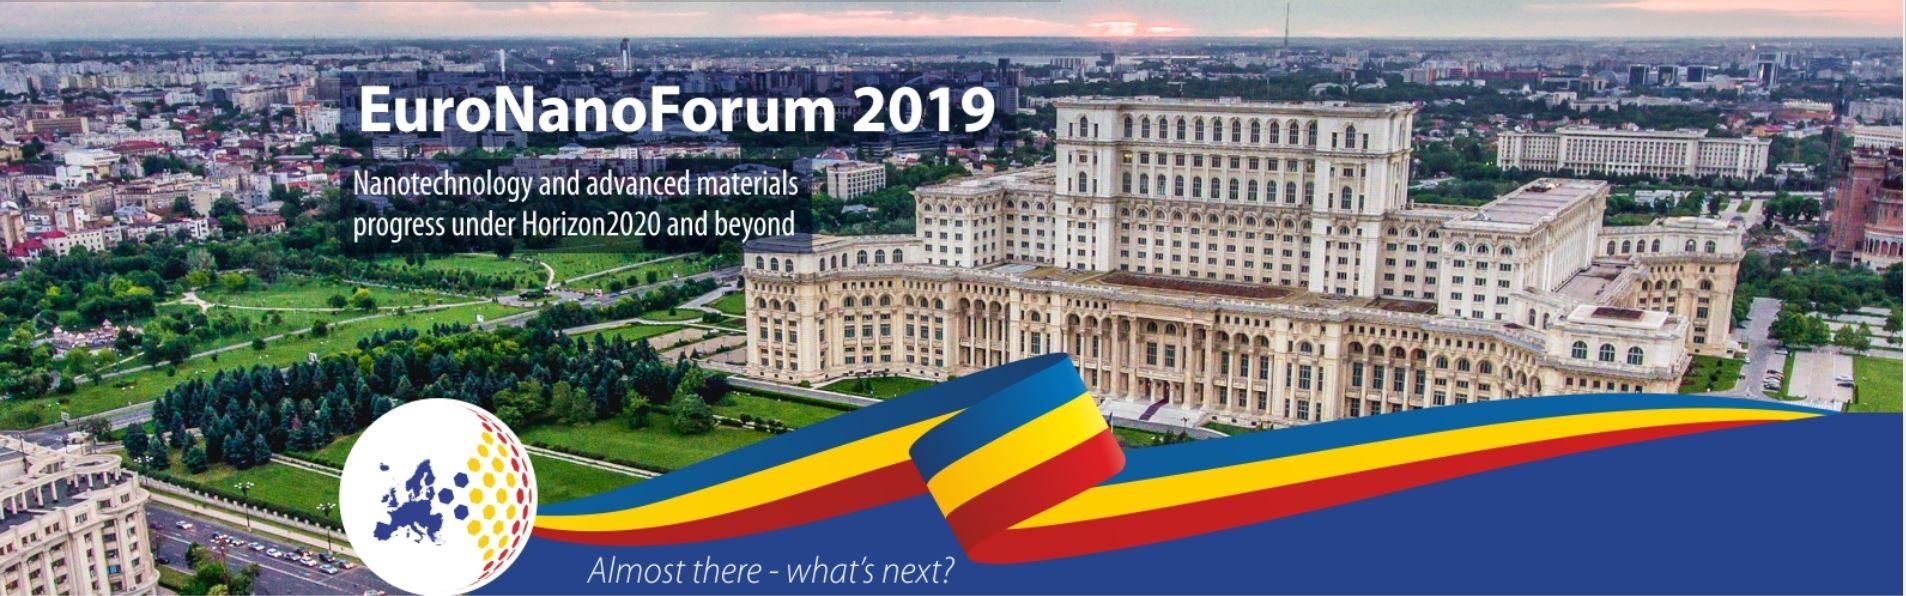 Conferinta  EuroNanoForum 2019 - Nanotechnology and advanced materials progress under Horizon 2020 and beyond euronanoforum.JPG